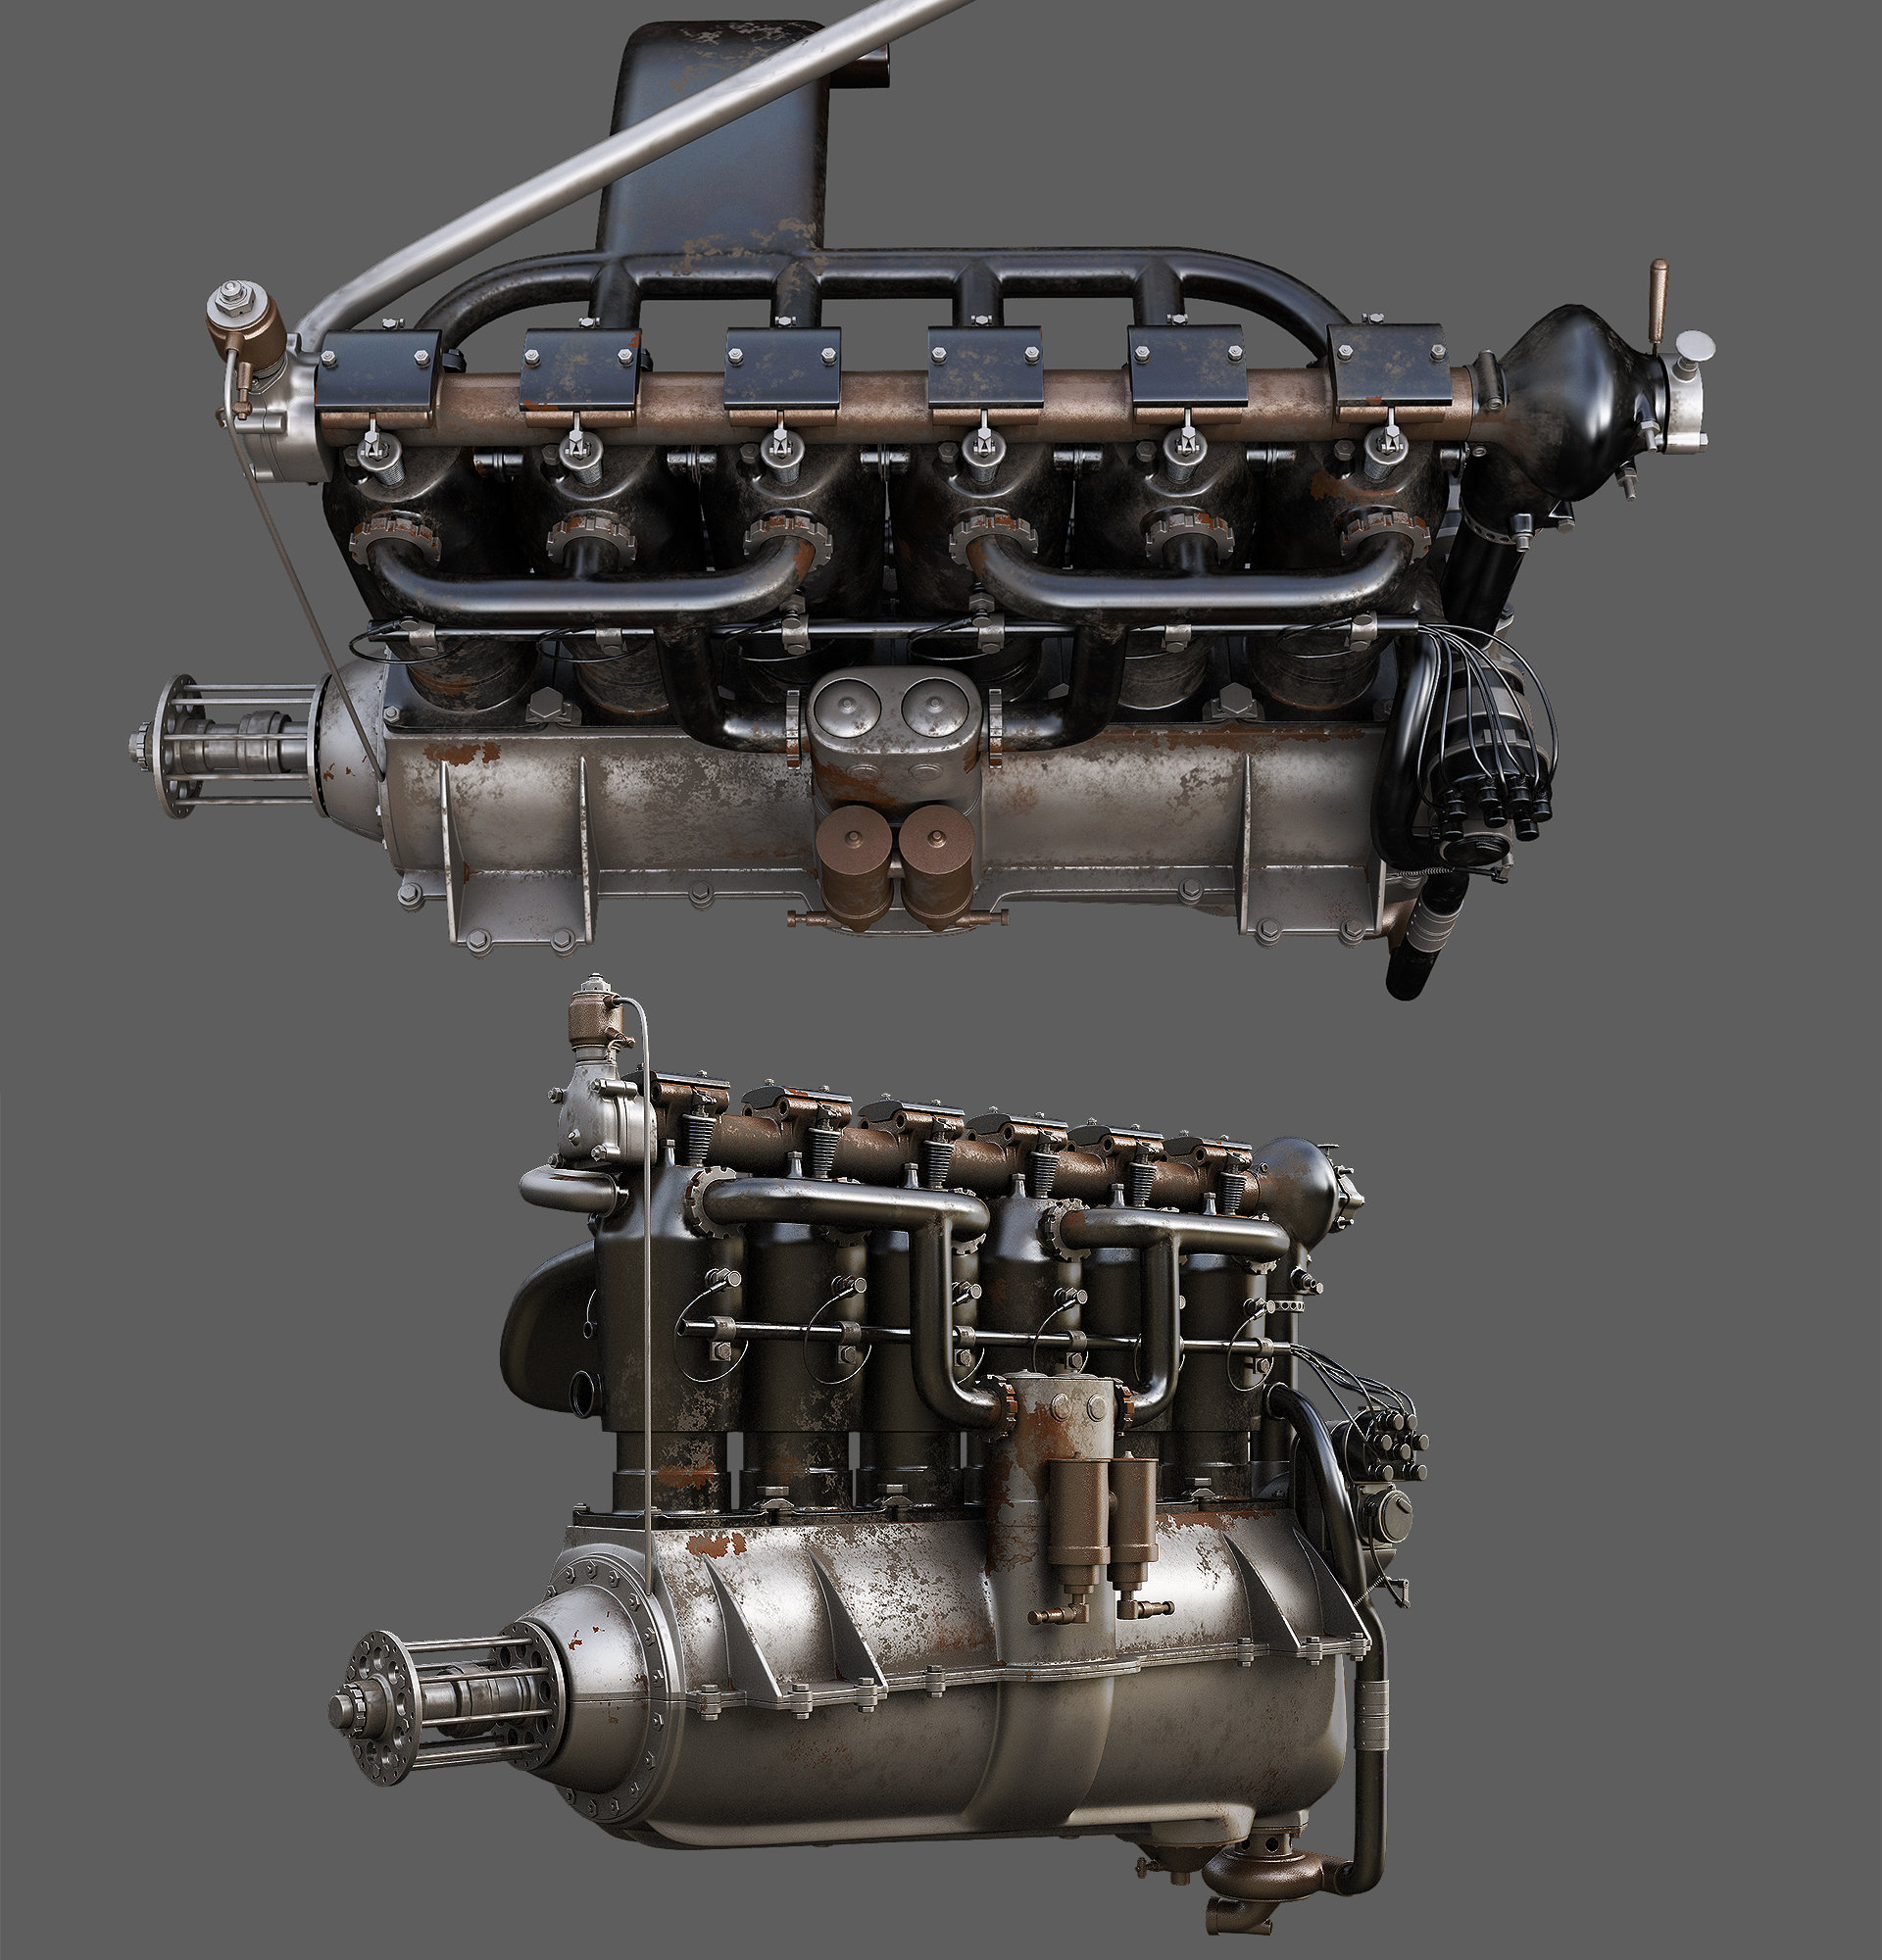 Alexandr novitskiy mercedes diii engine 06